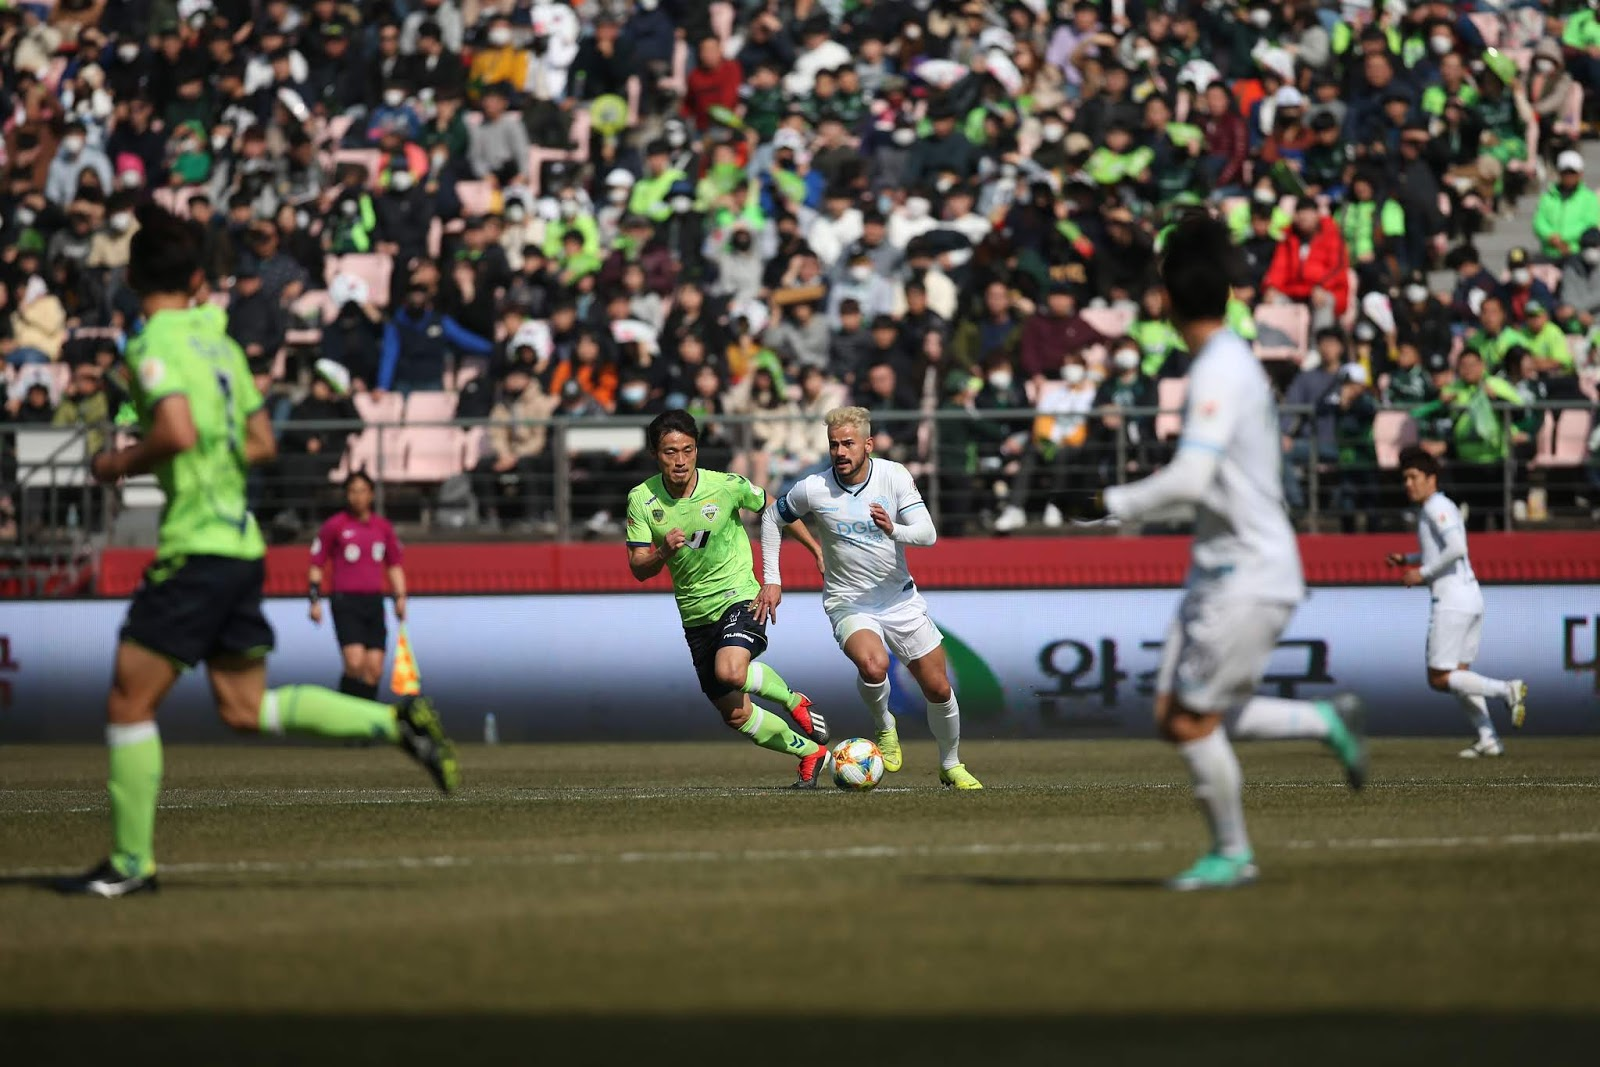 Preview: Daegu FC vs Jeonbuk Hyundai Motors K League 1 Round 20